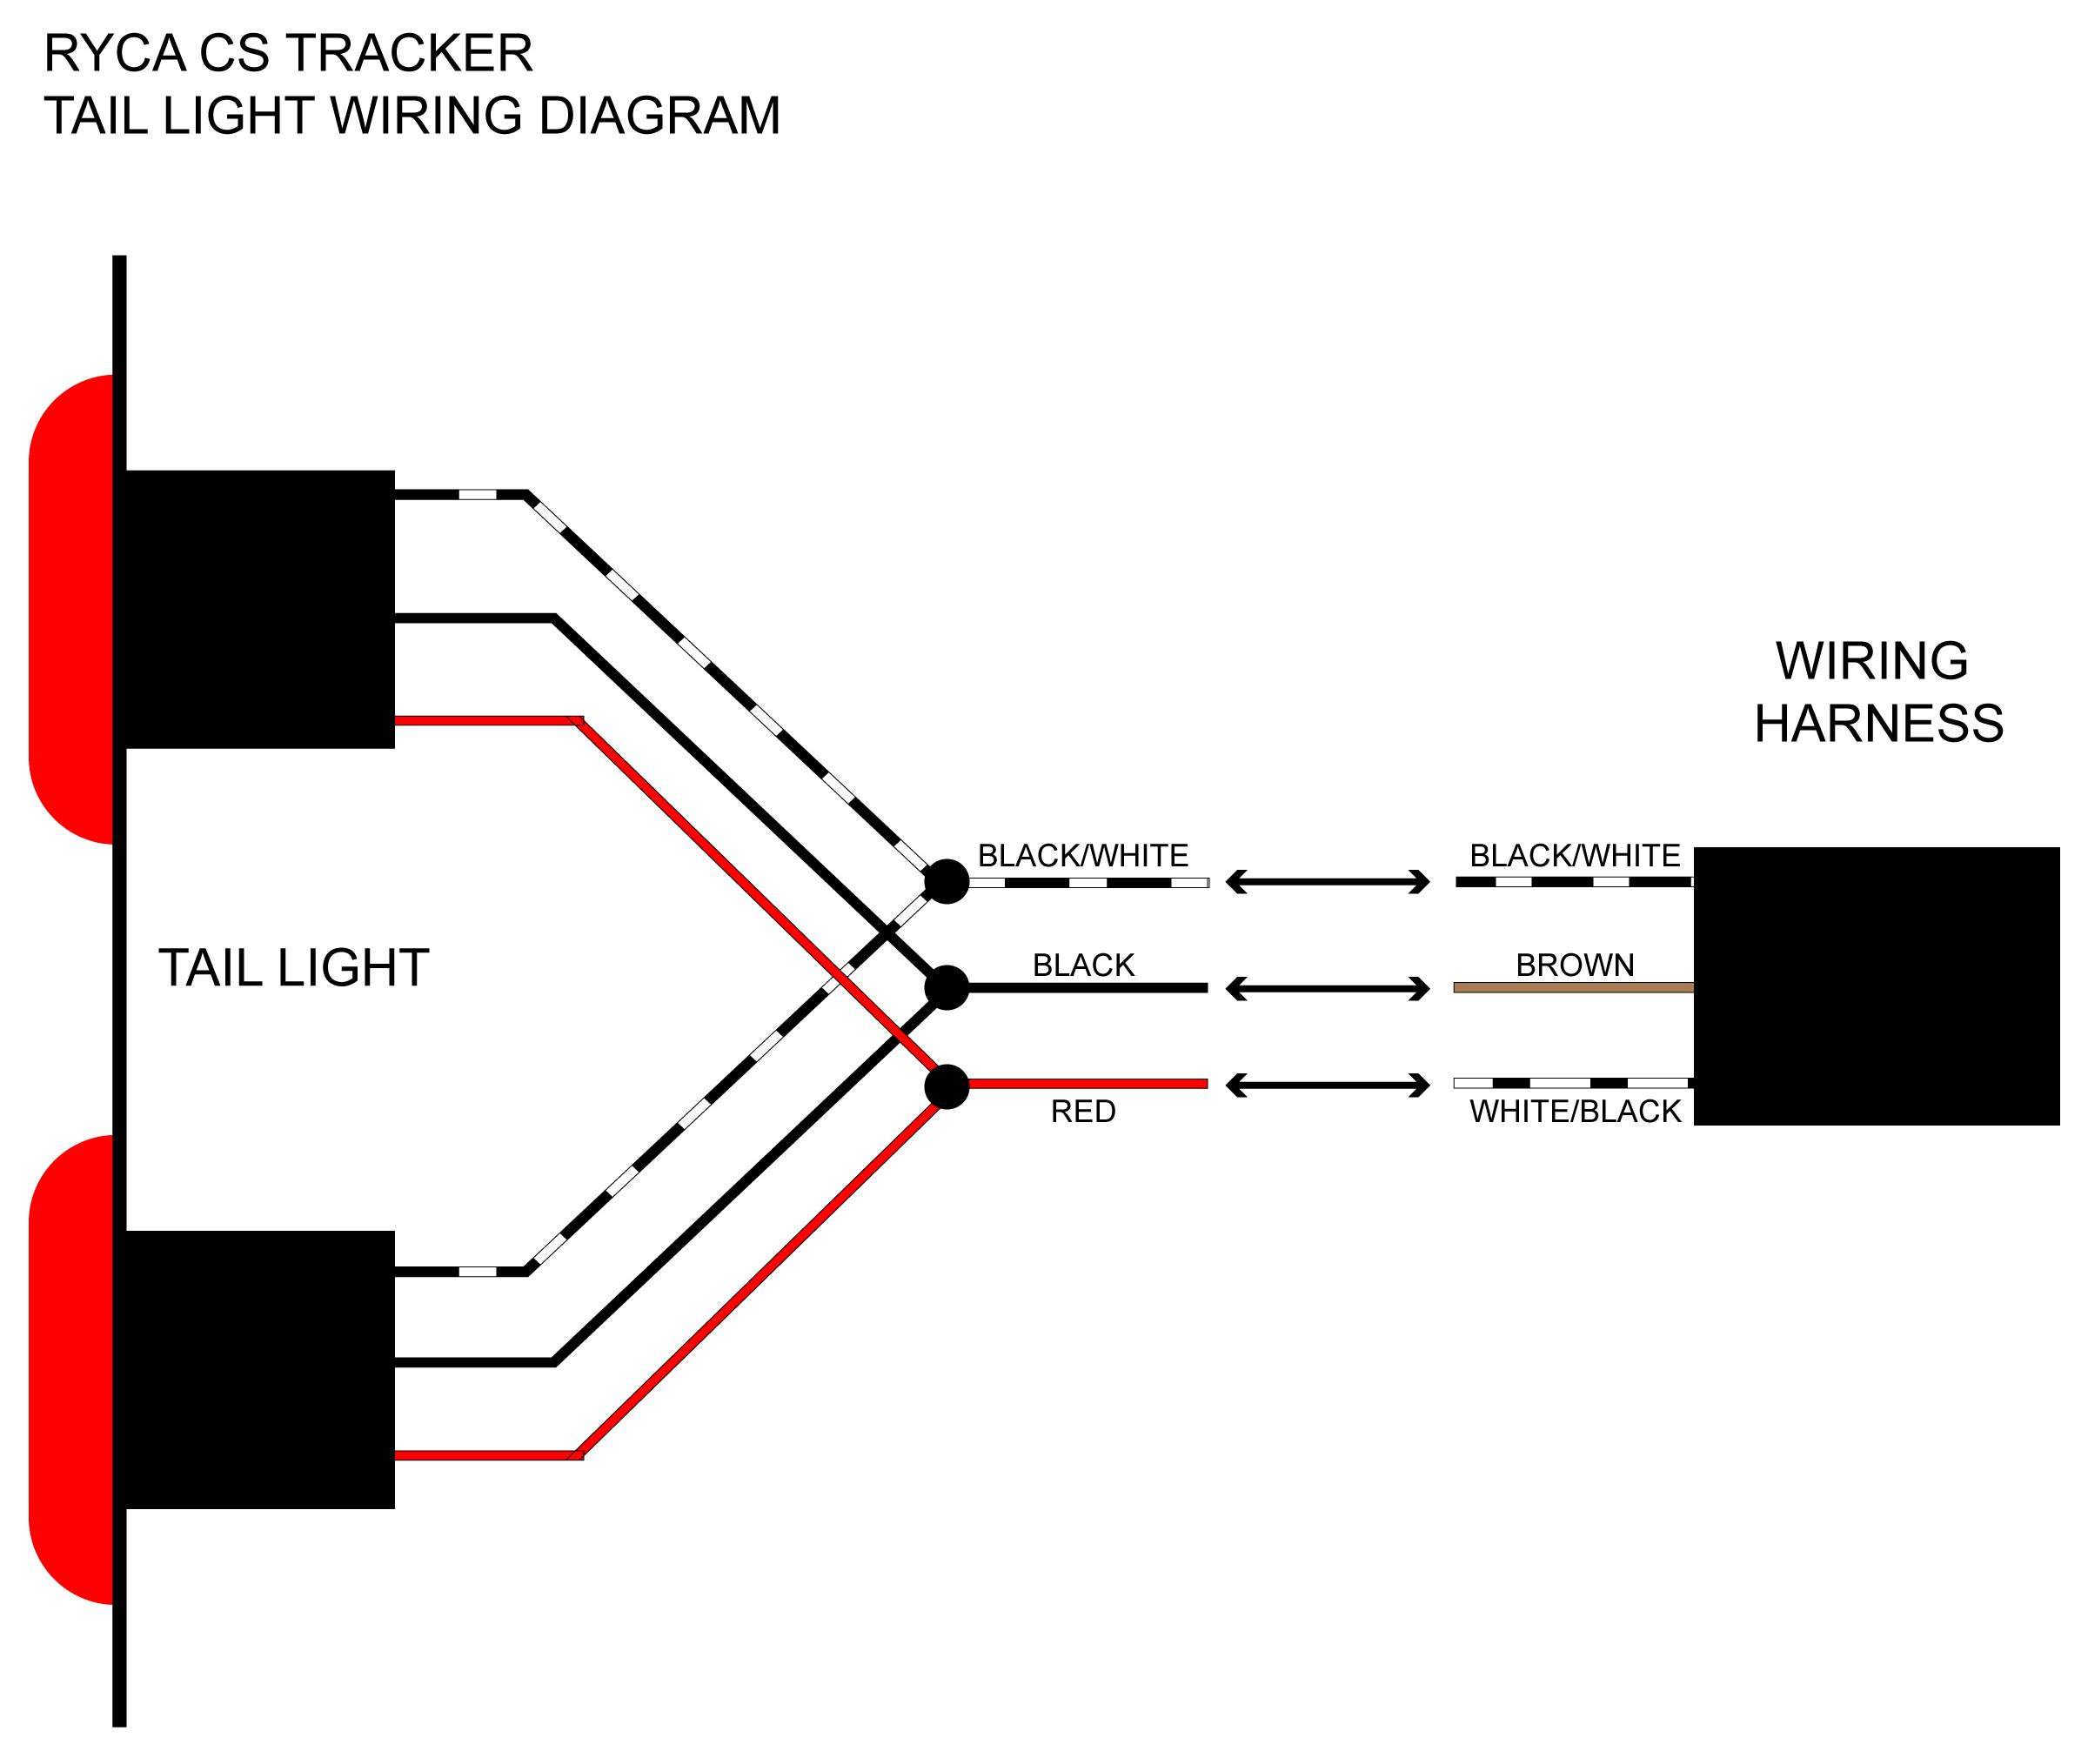 Led Tail Light Wiring Diagram - Wiring Diagrams Thumbs - Tail Light Wiring Diagram